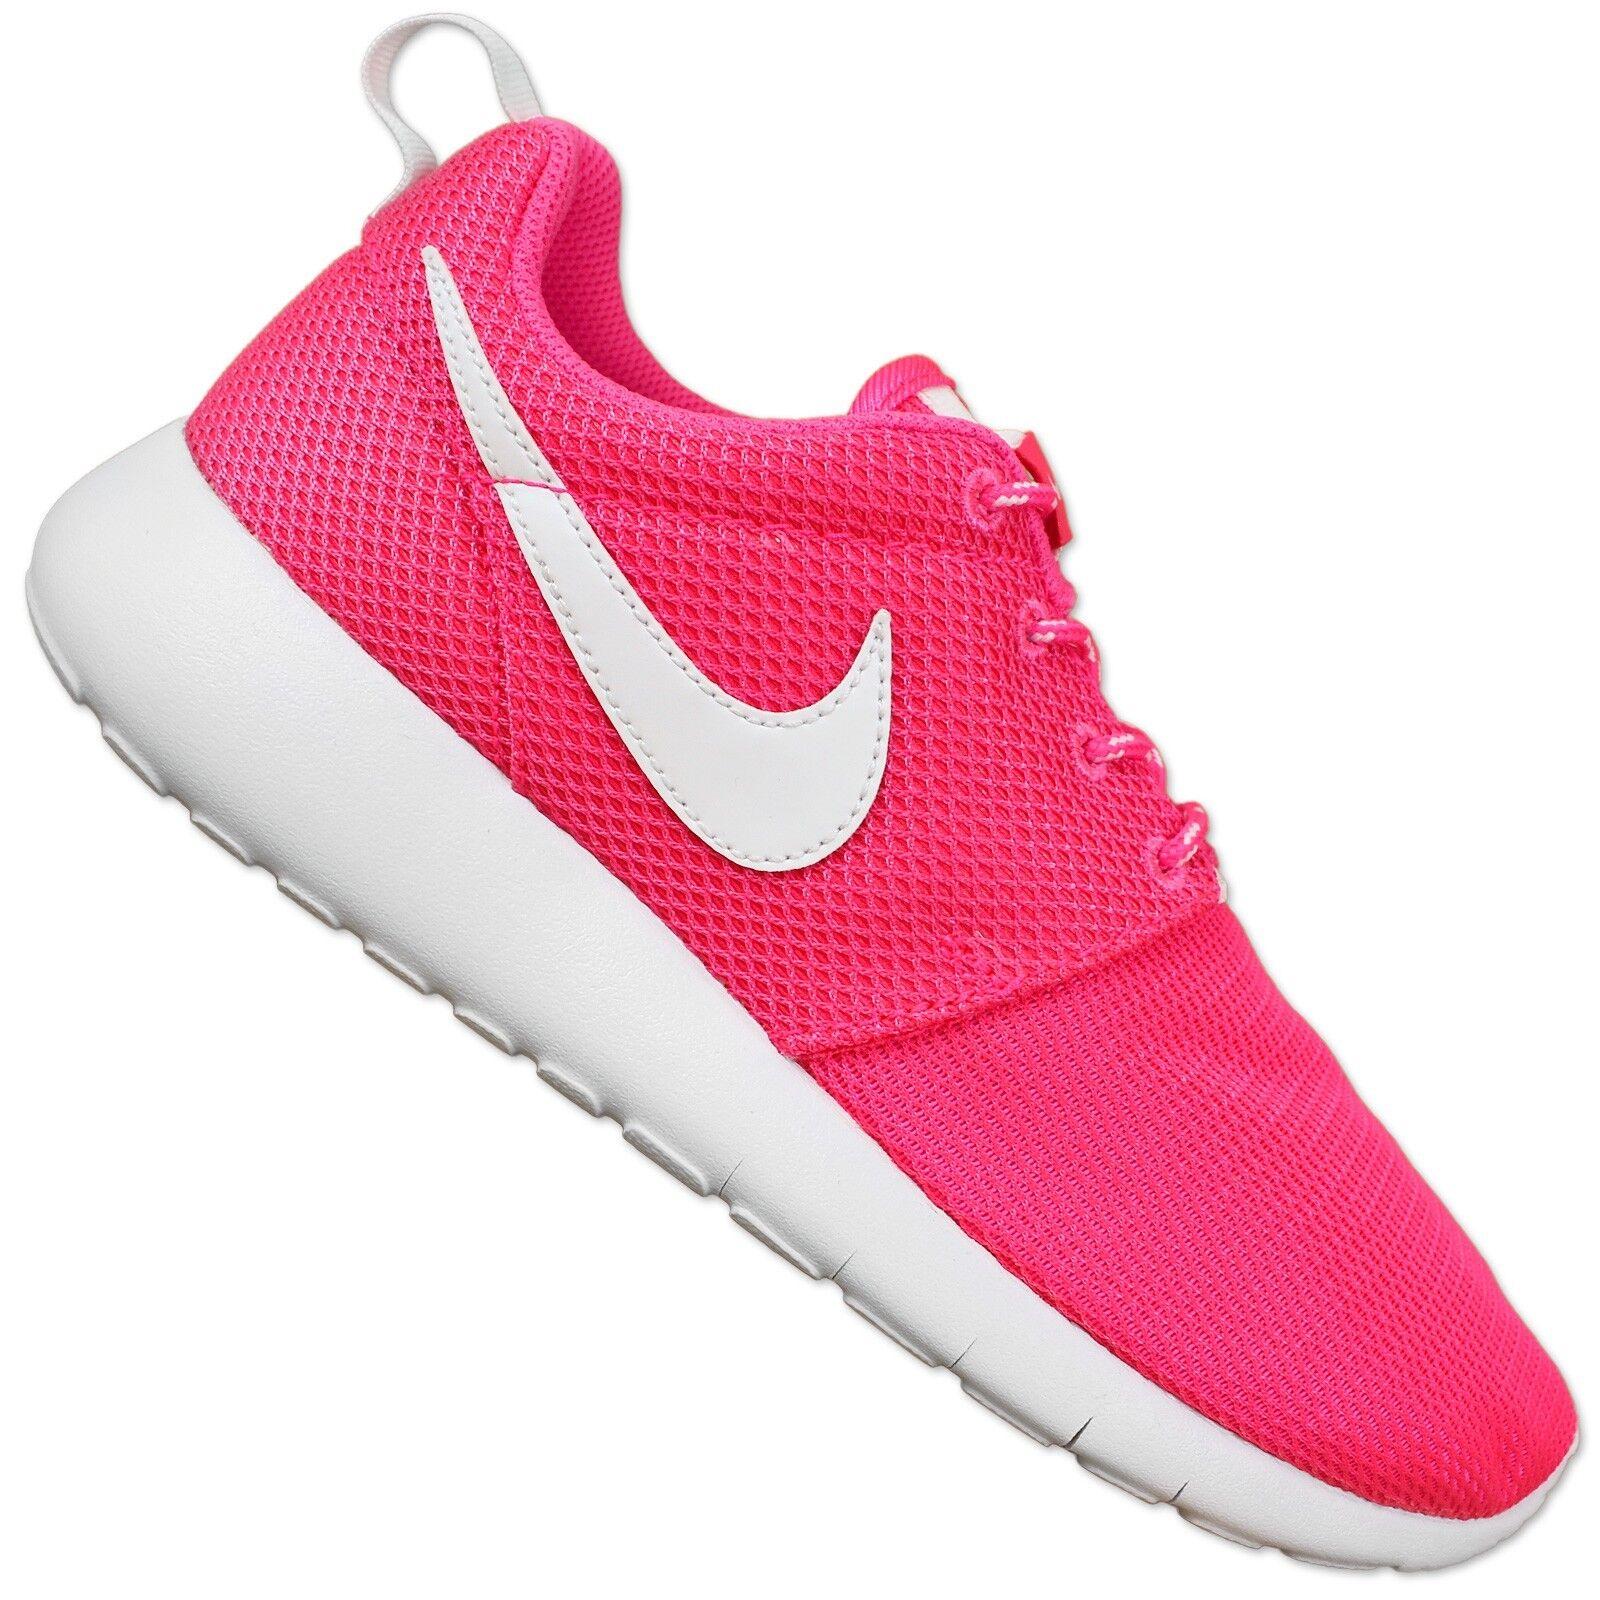 Zapatos promocionales para hombres y mujeres NIKE ROSHE ONE LAUFSCHUH LUNARLON JOGGEN FREIZEIT SNEAKER RUNNING SCHUHE PINK